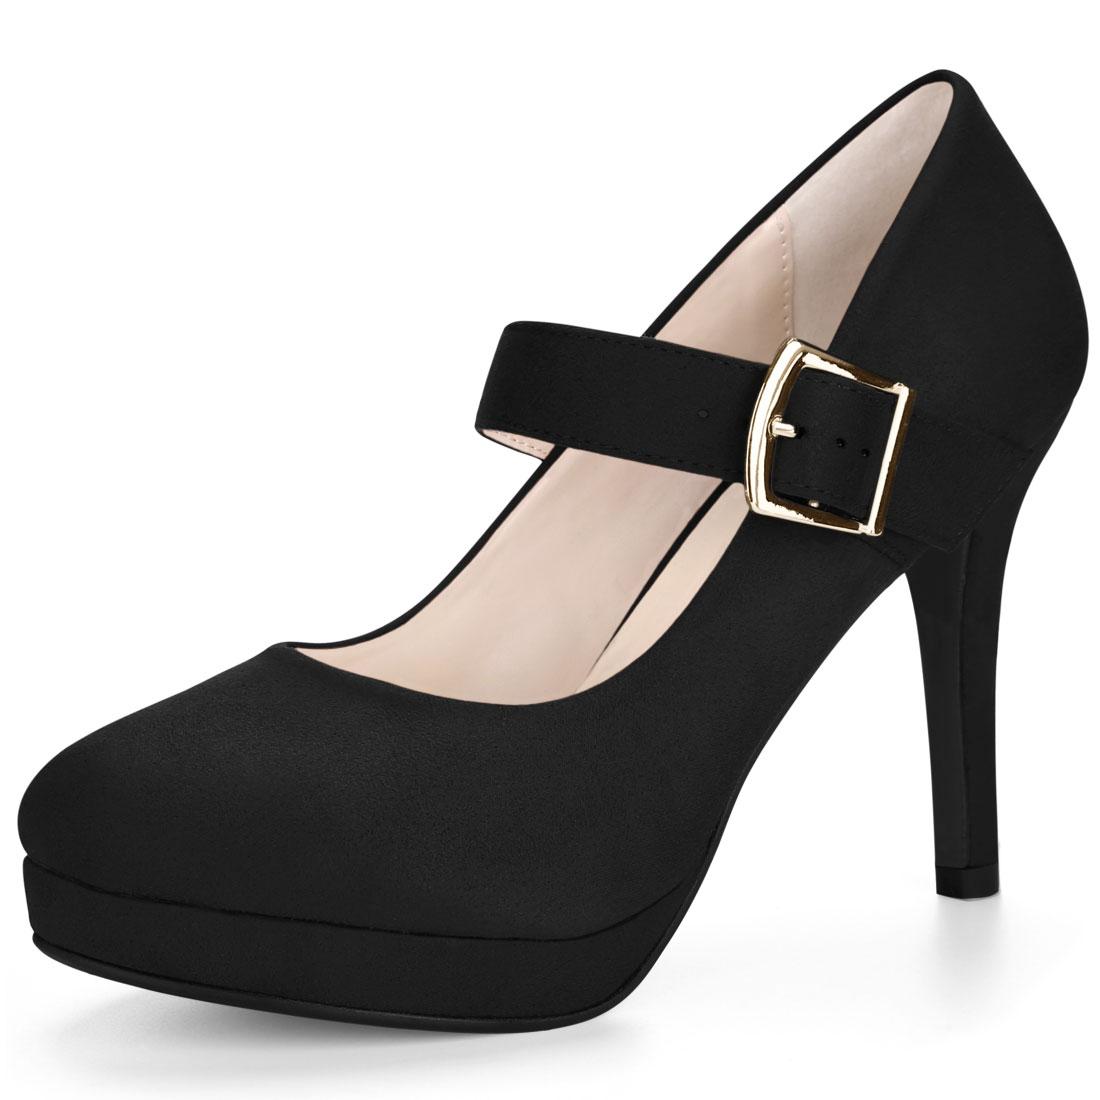 Allegra K Women's Rounded Toe Stiletto Platform Buckle Strap Pumps Black US 6